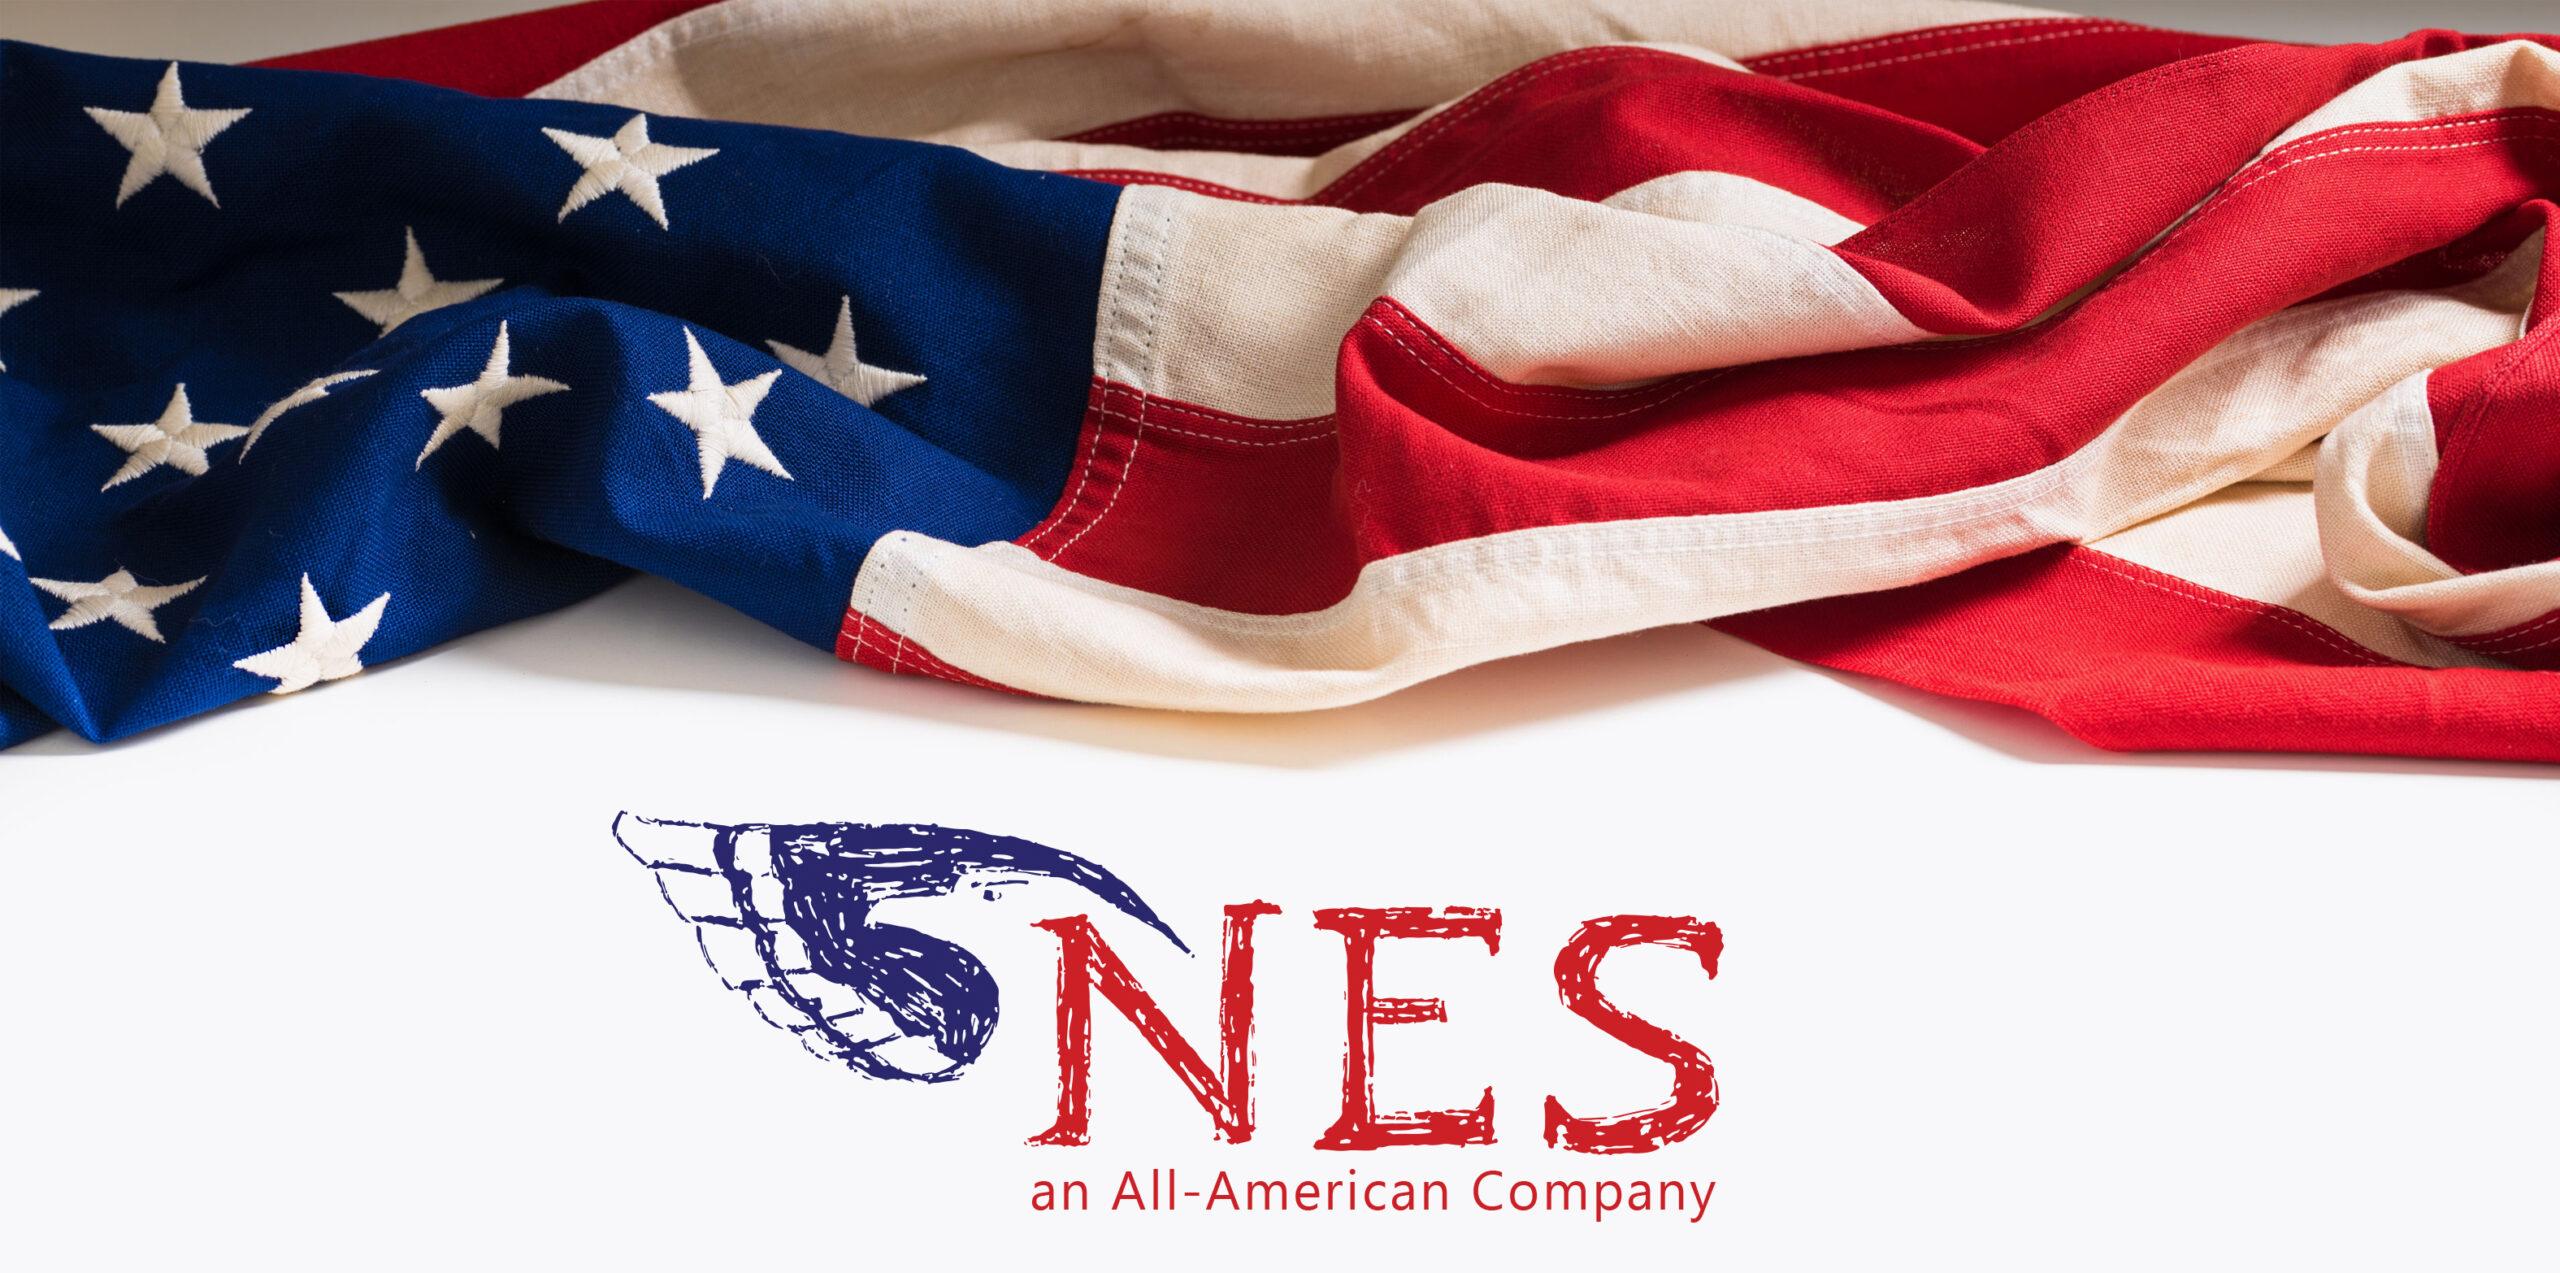 american-company flag logo